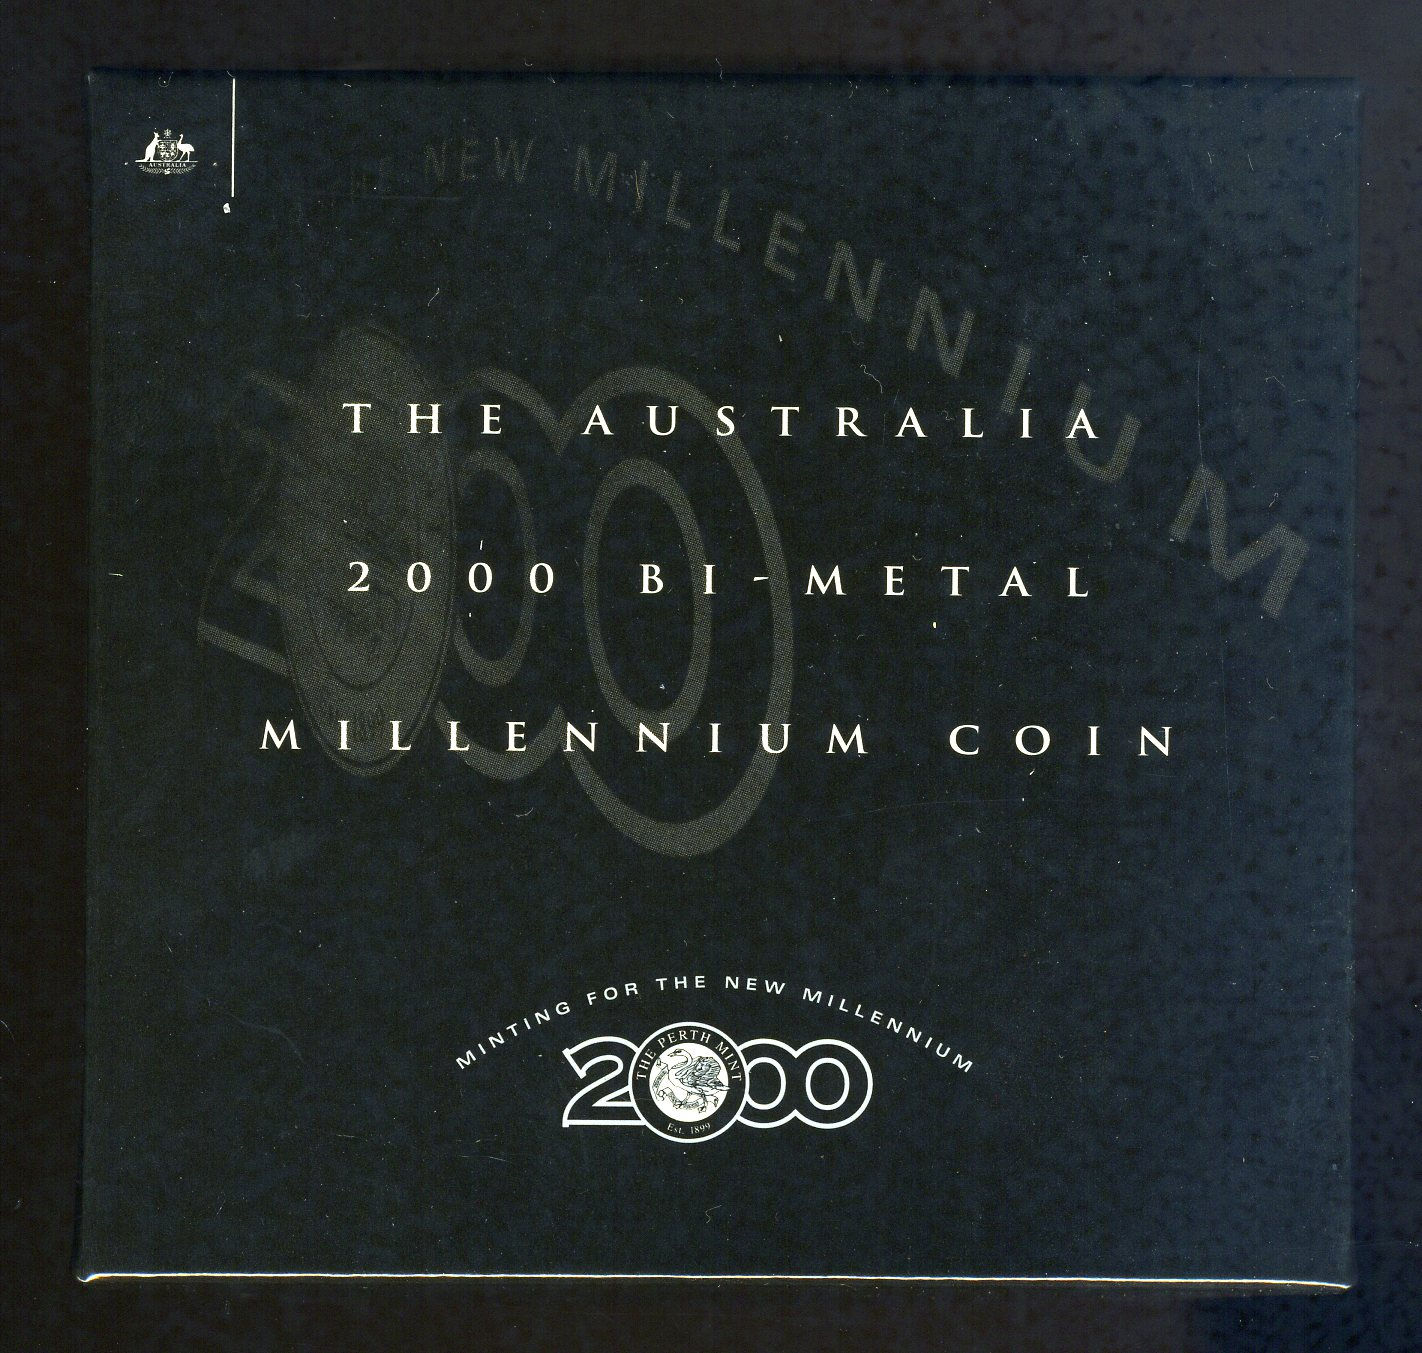 Thumbnail for 2000 Australian Bi-Metal Millenium Coin